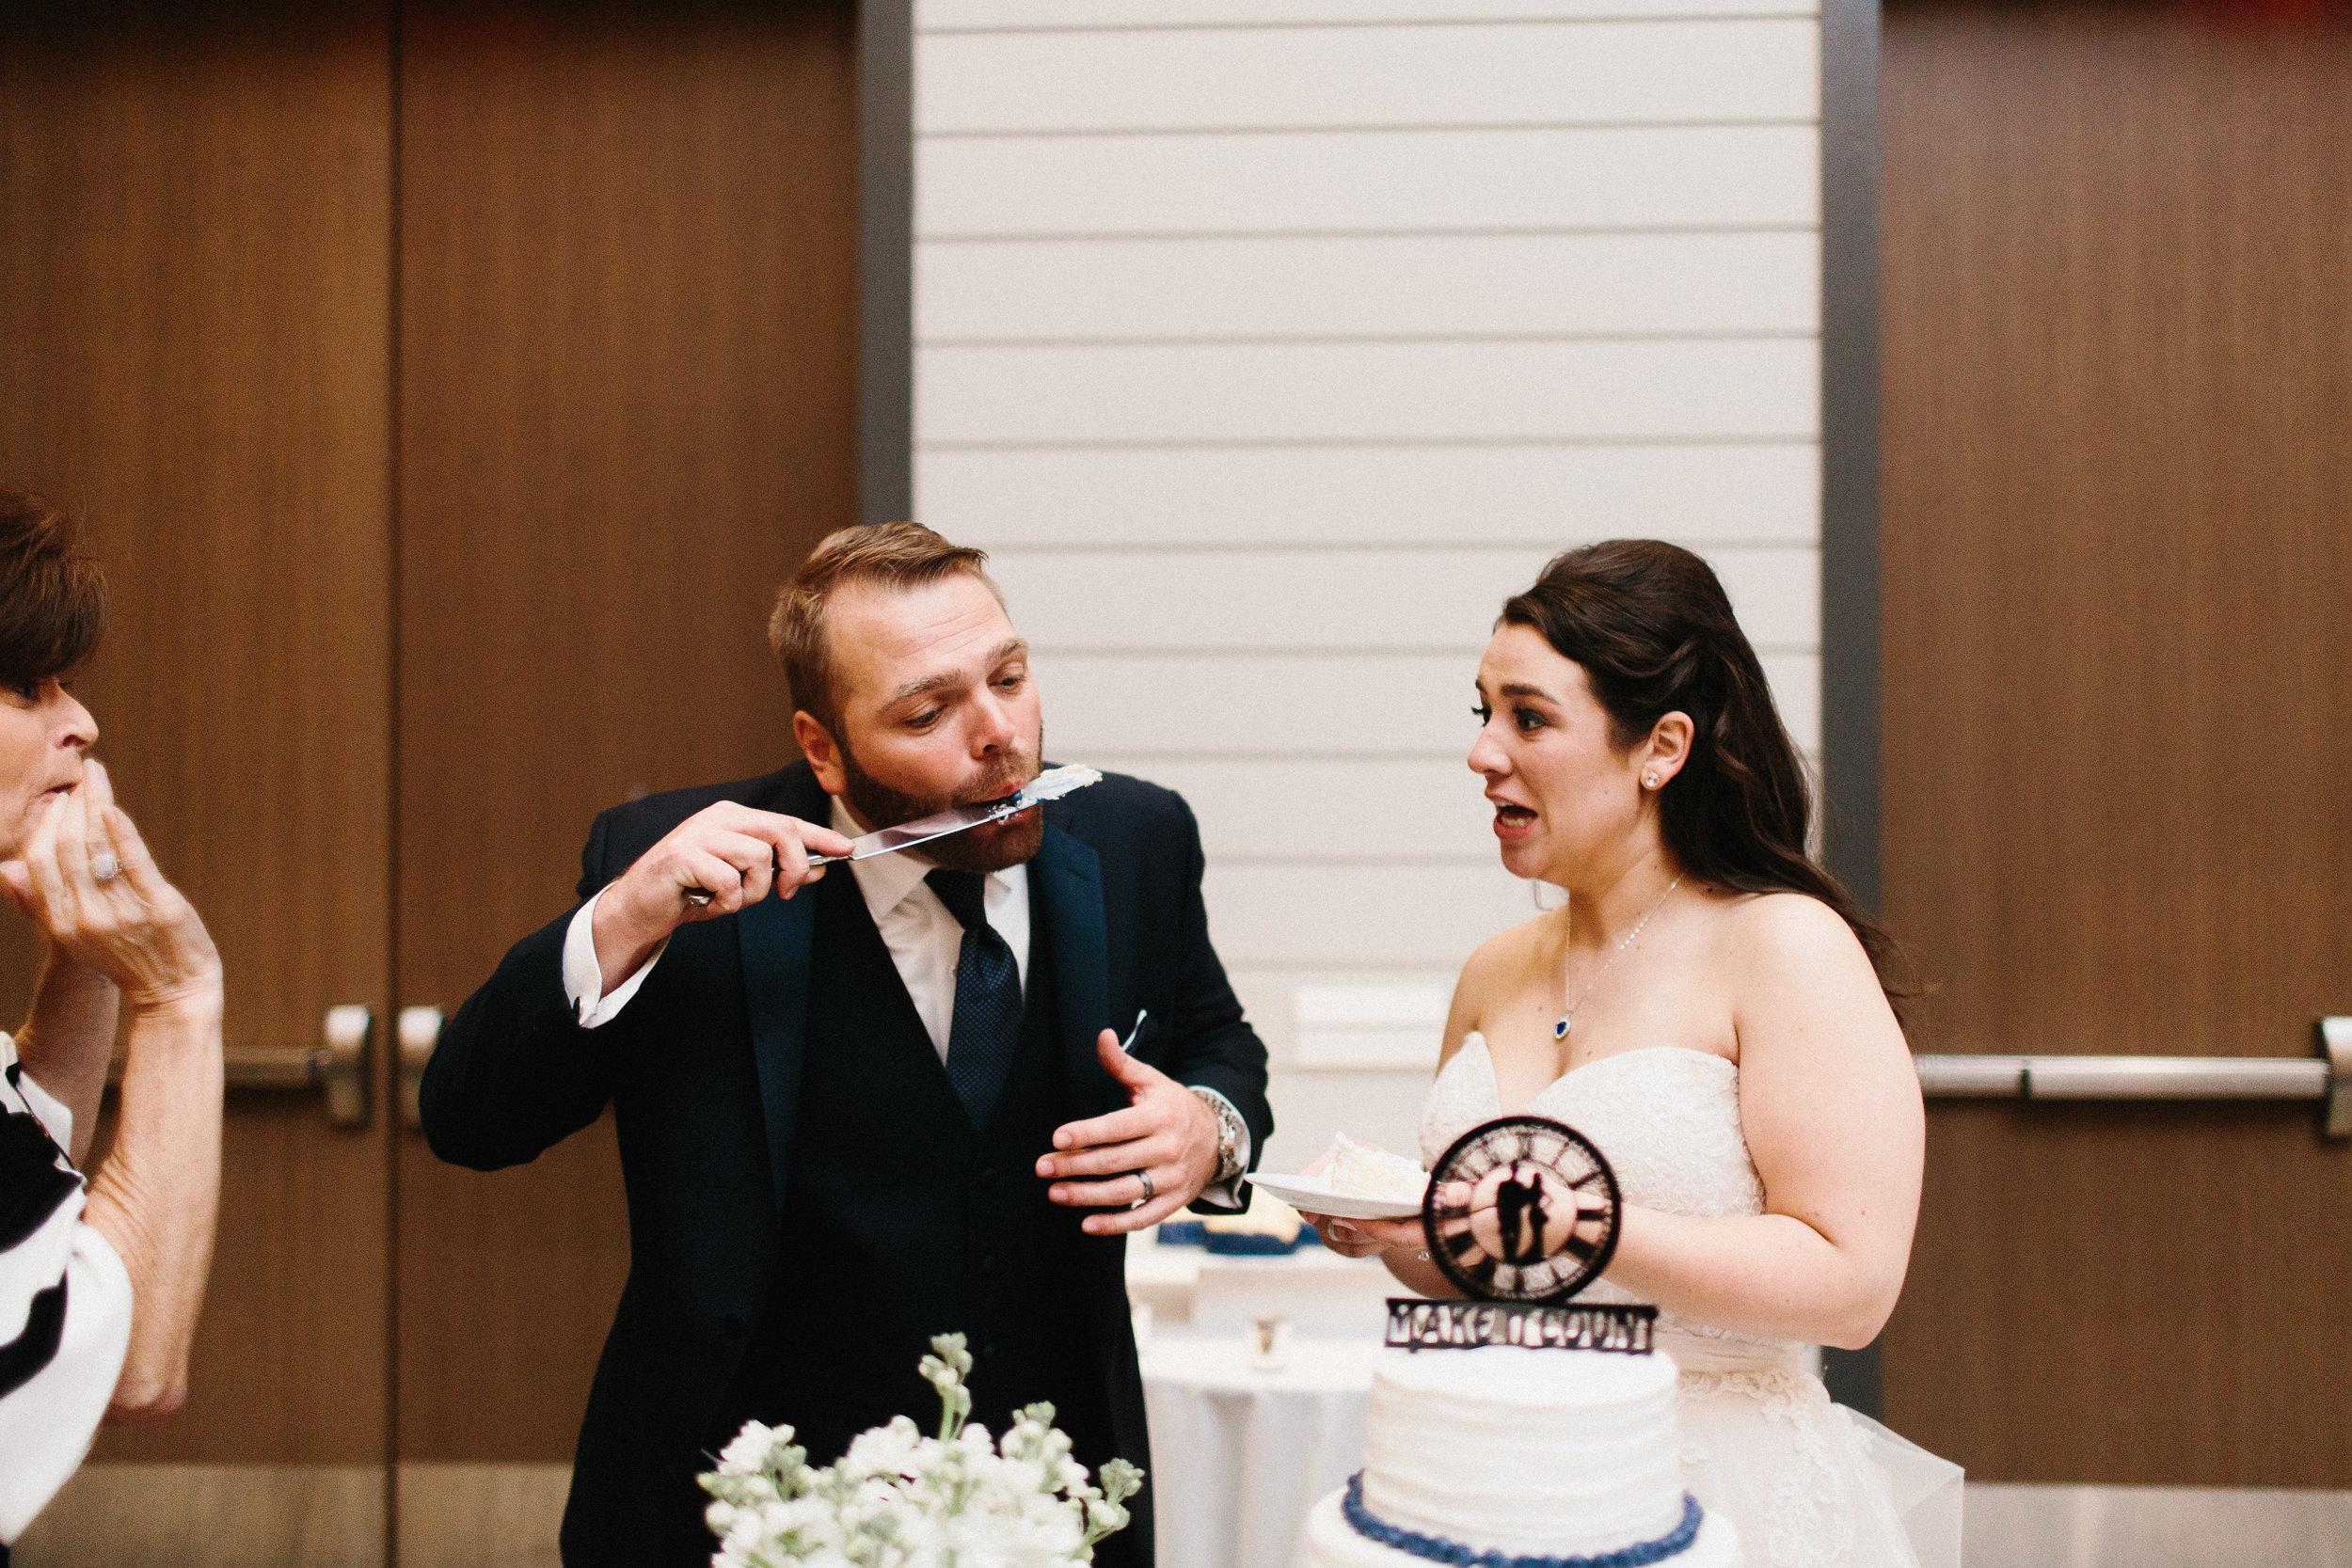 roswell_st_peter_chanel_catholic_avalon_hotel_alpharetta_wedding-2111.jpg